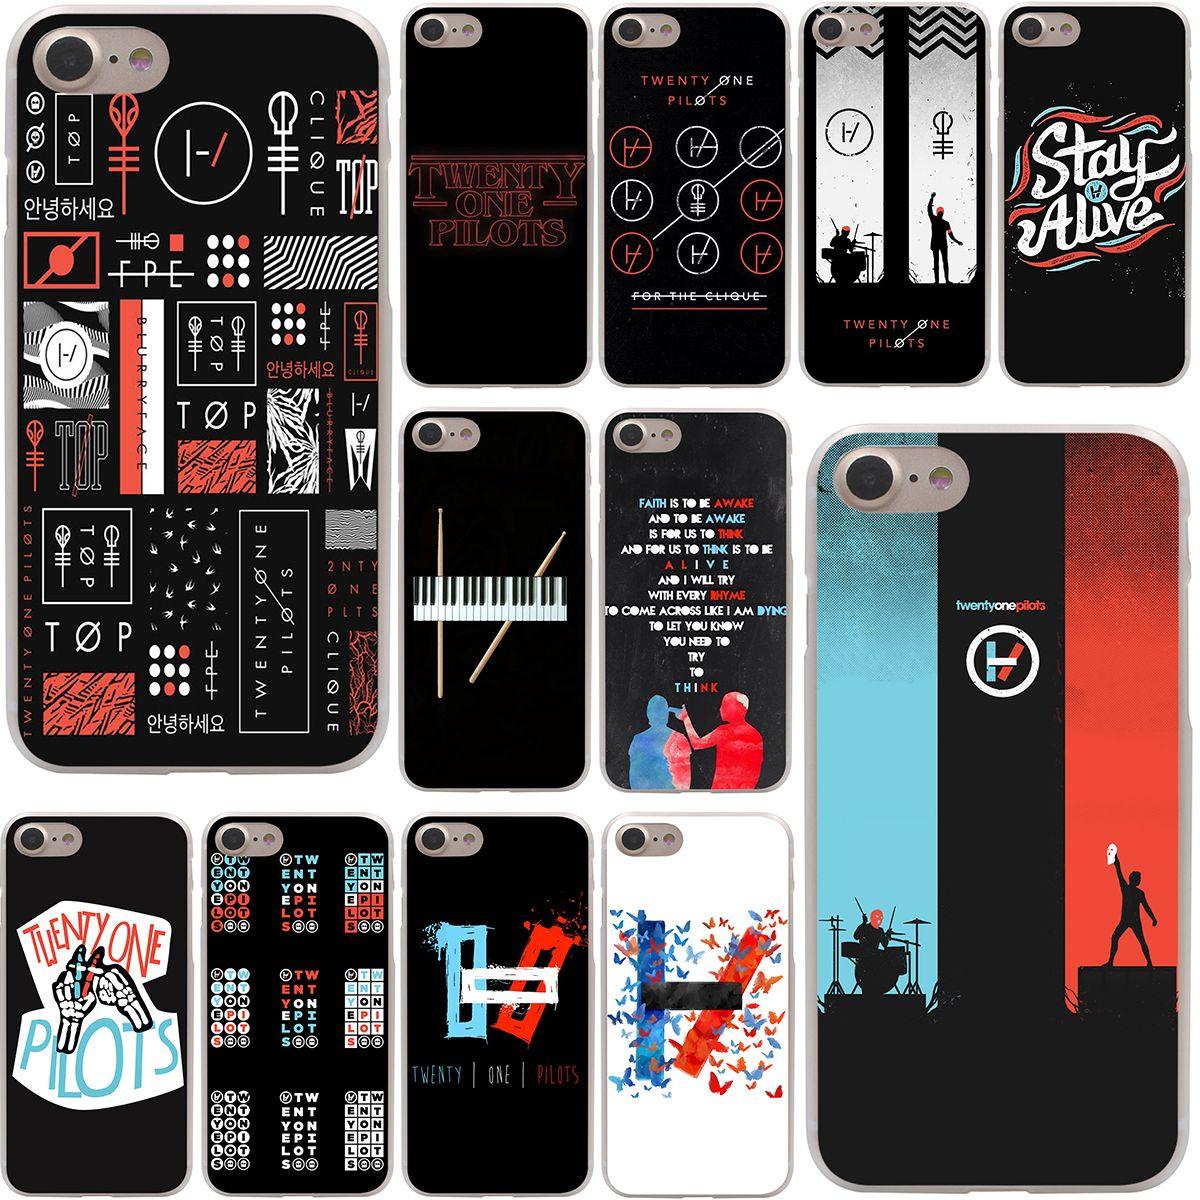 21 pilots iphone 7 case